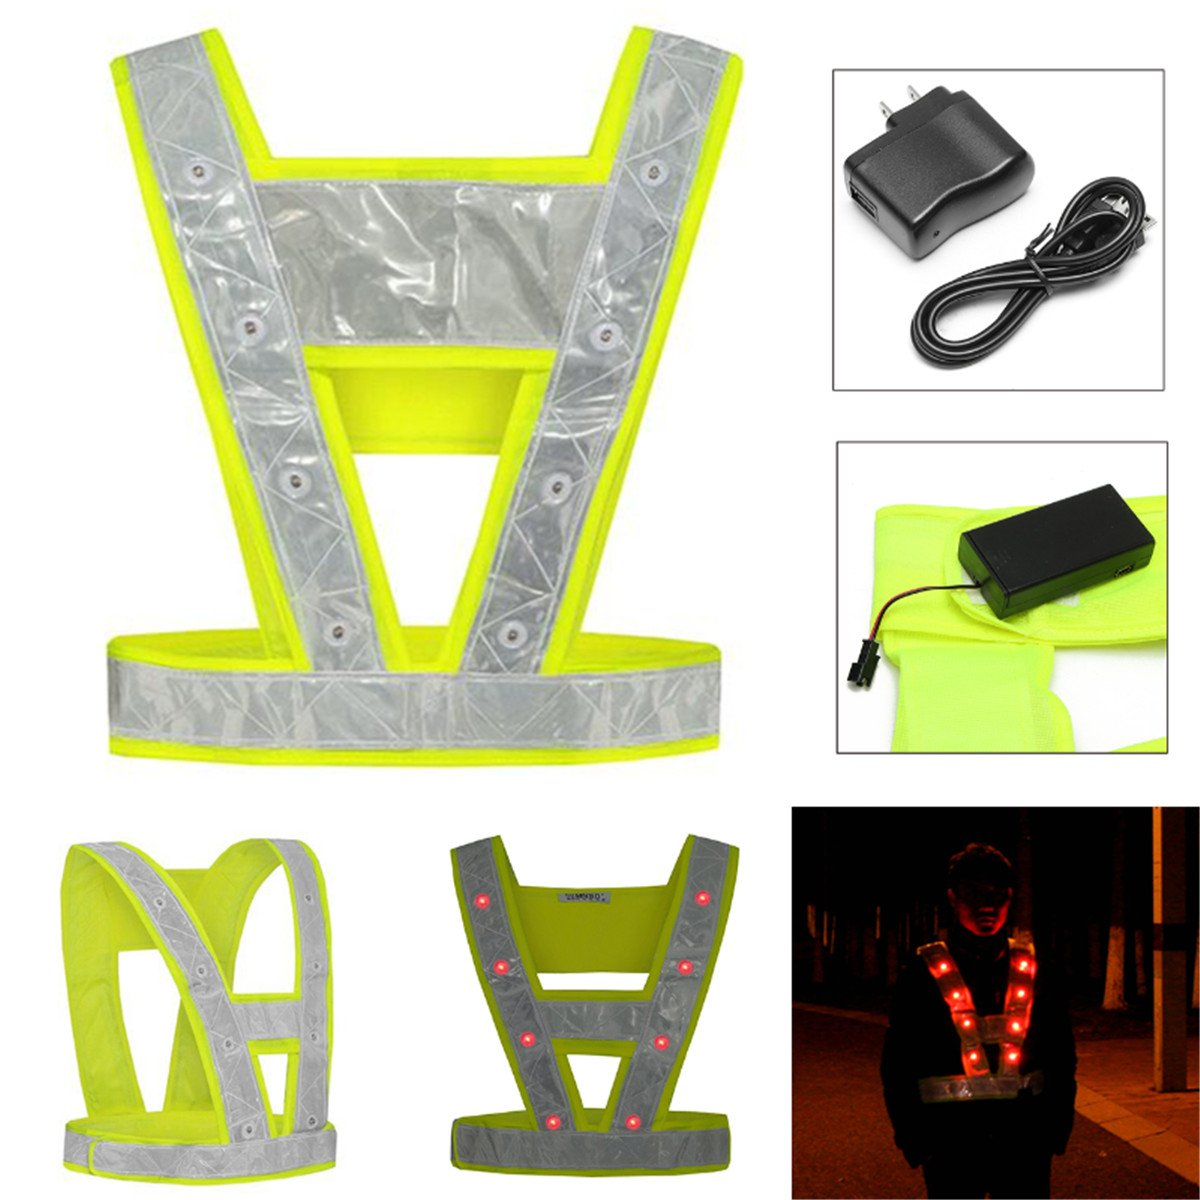 OlogyMart Cycling Running 16 LED Light Up Reflective Stripes Safety Vest High Visibility